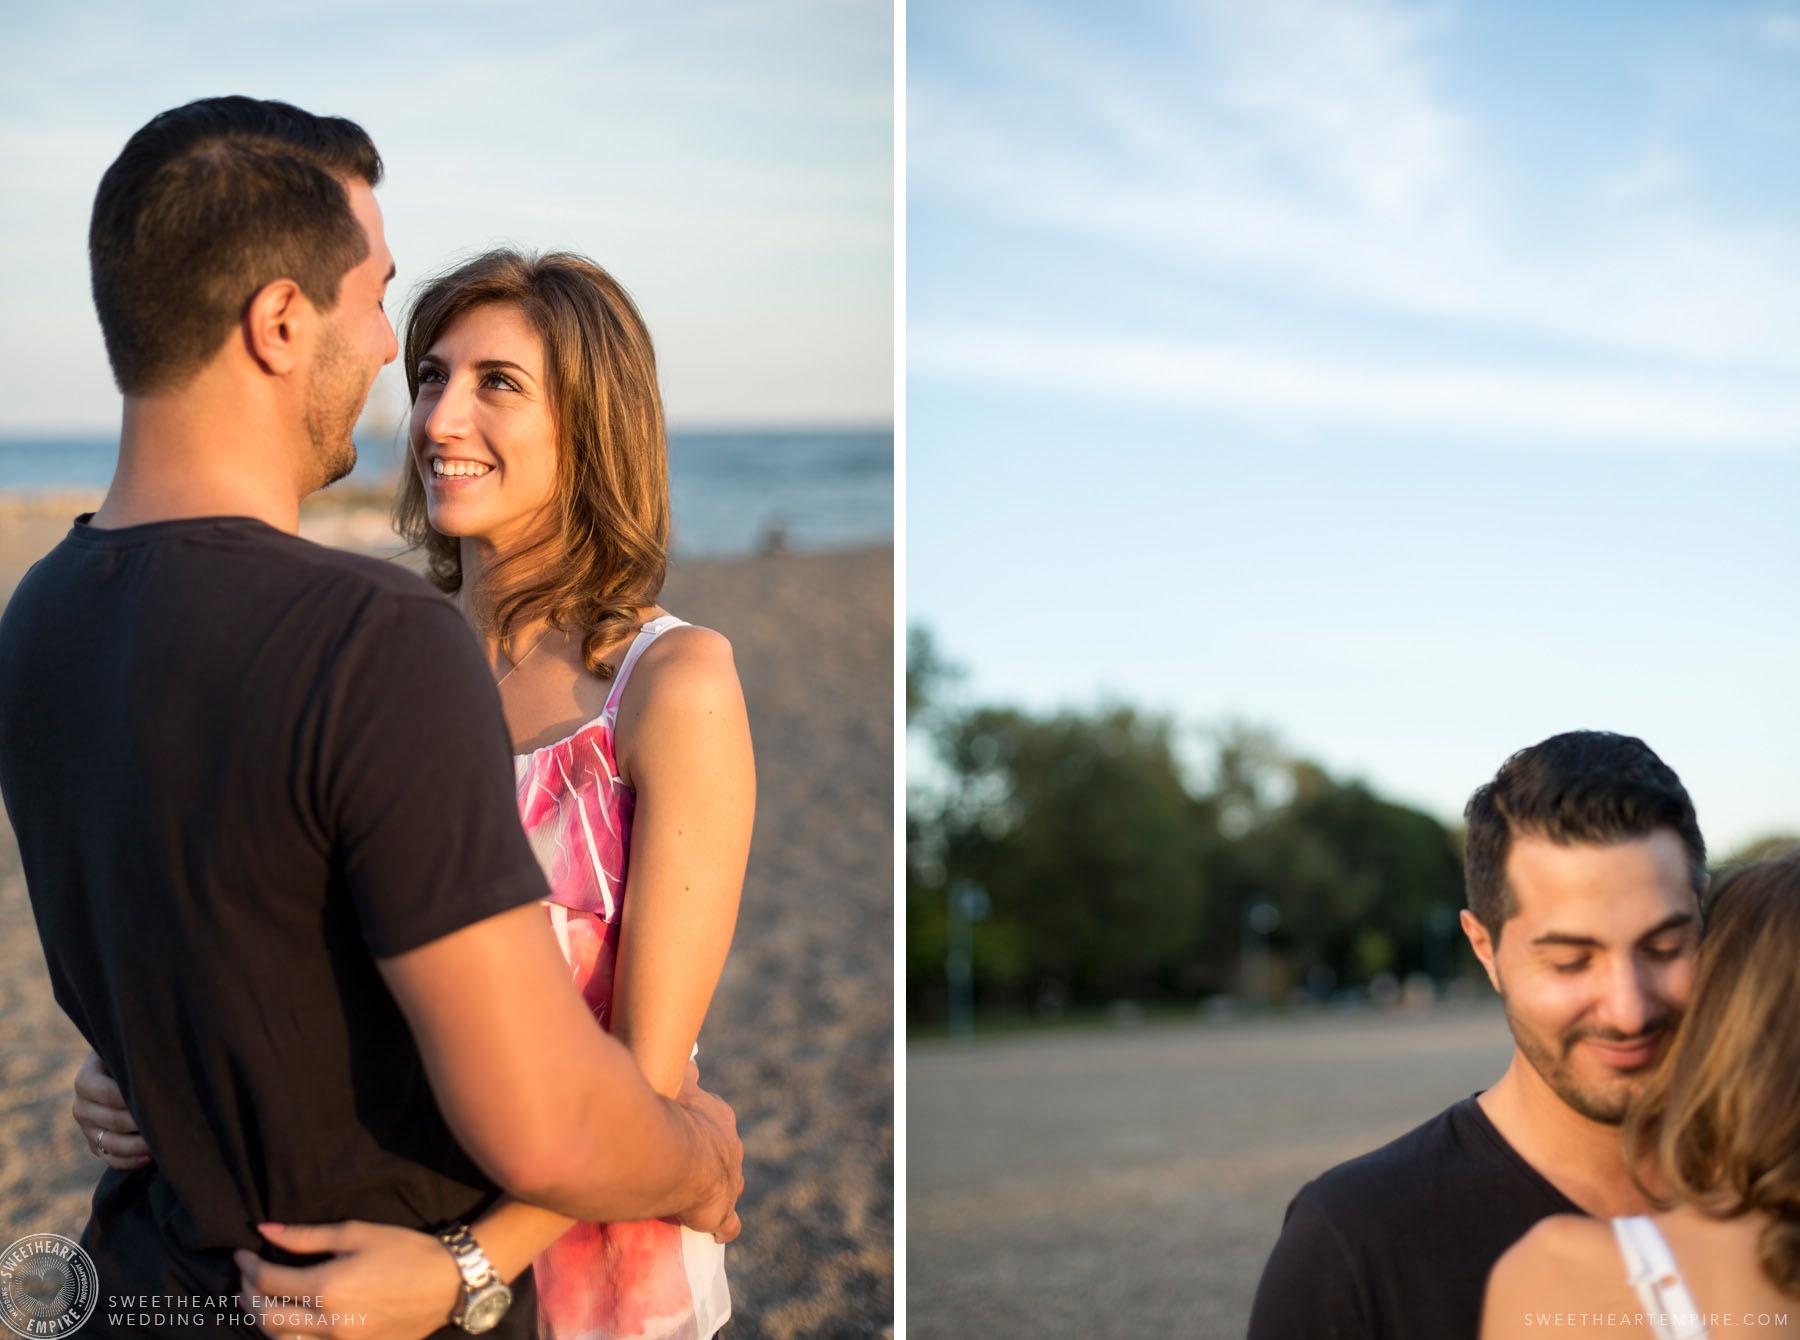 07_Beaches-Park-Boardwalk-Engagement-Photos